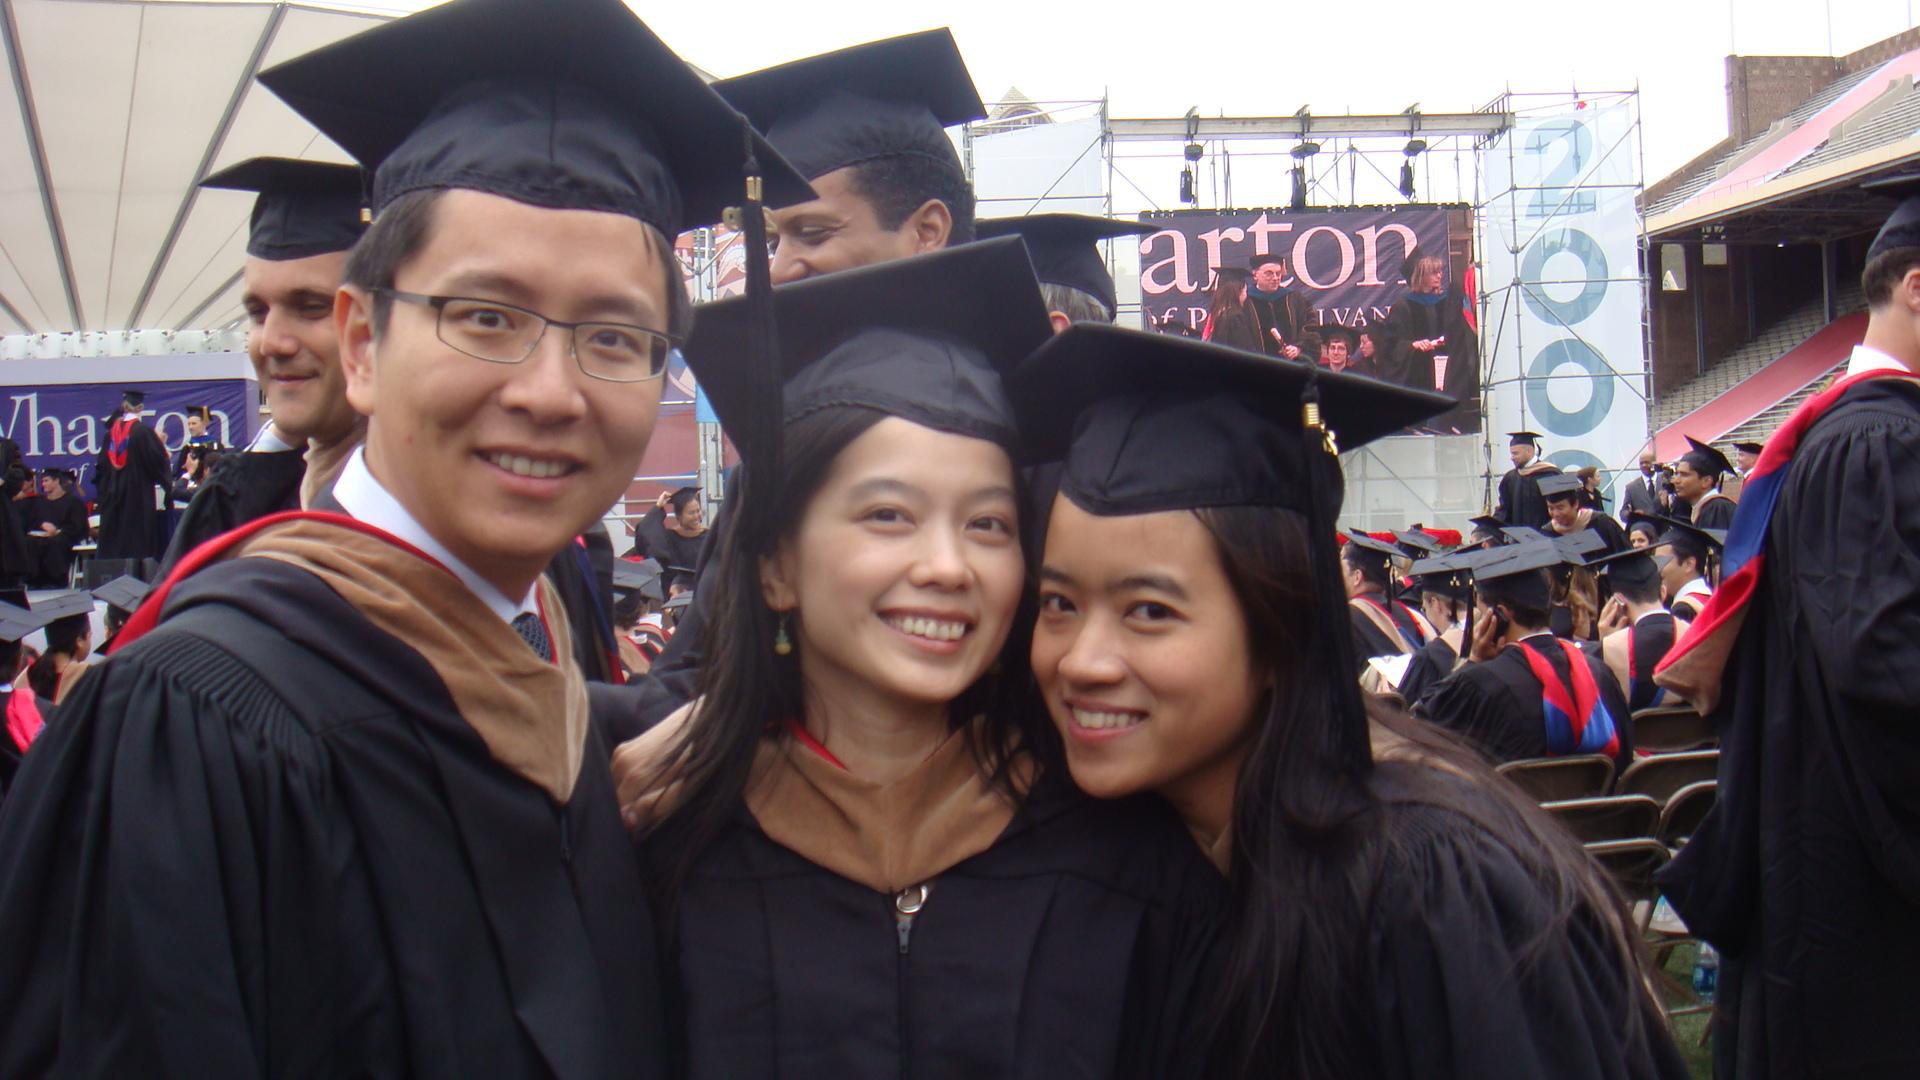 Wharton Graduation.JPG